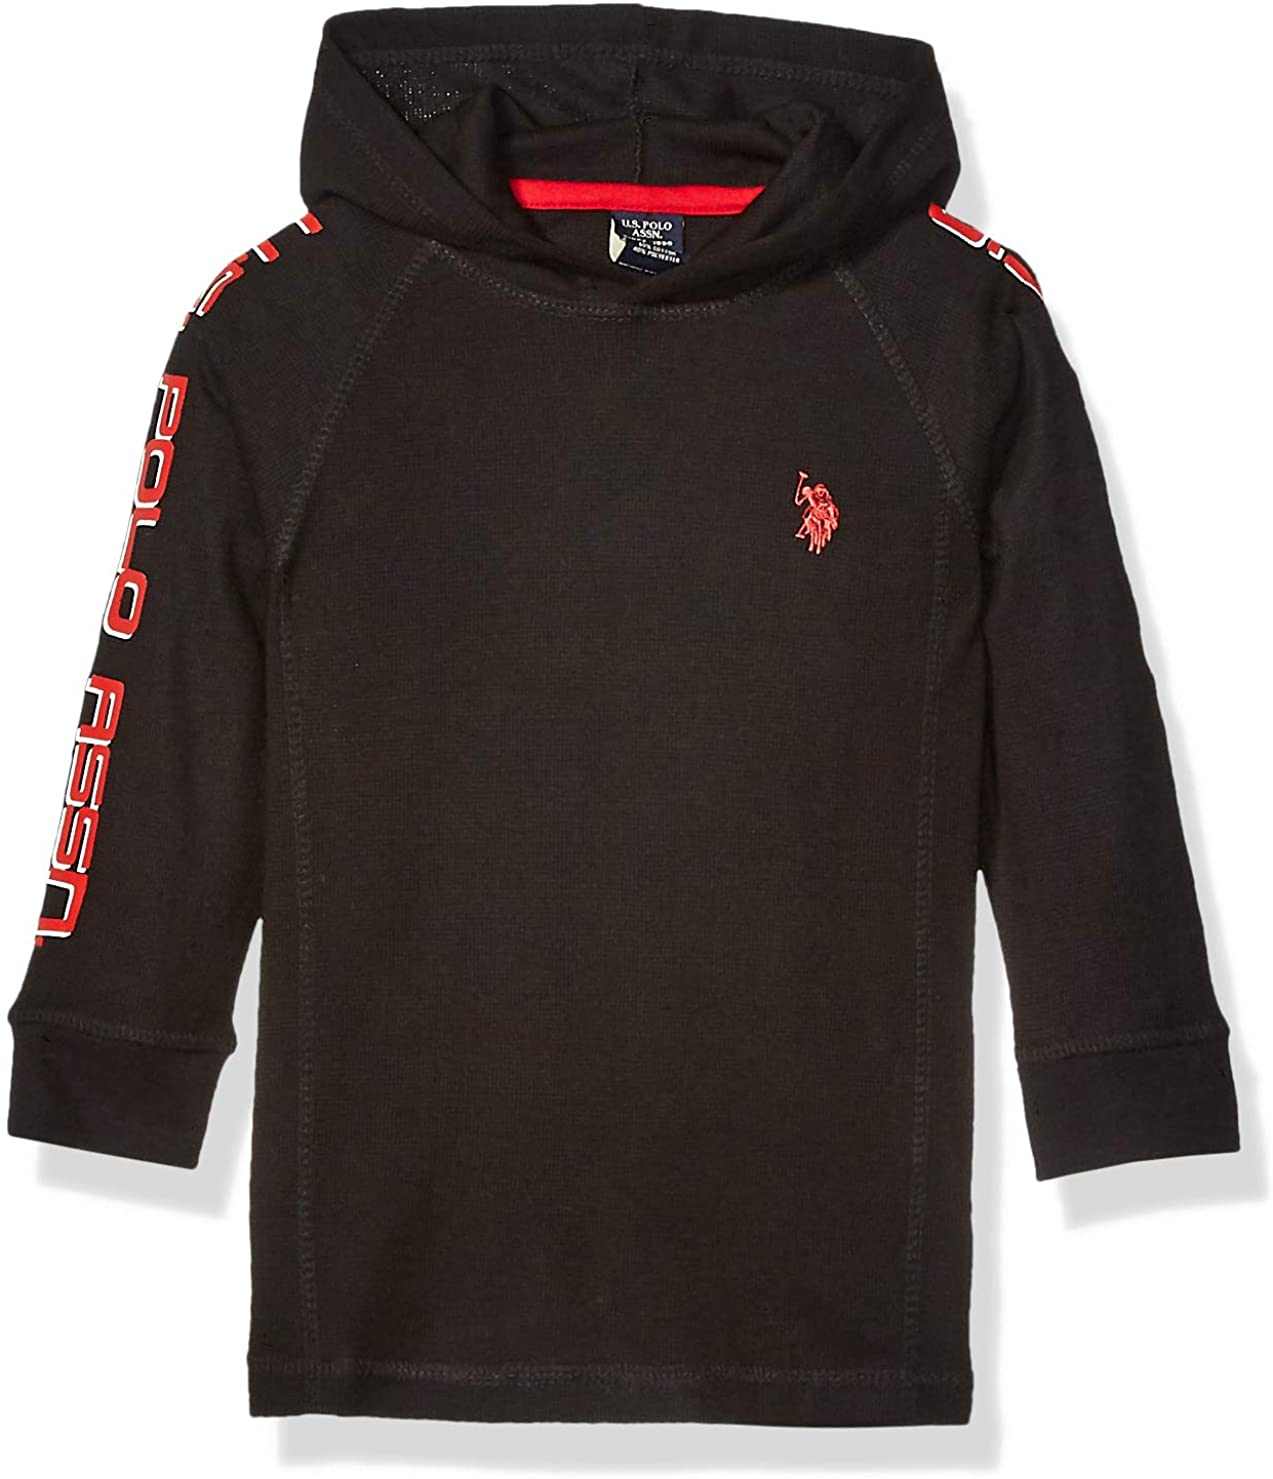 U.S. Polo Assn. Boys' Hooded Thermal Popover Shirt